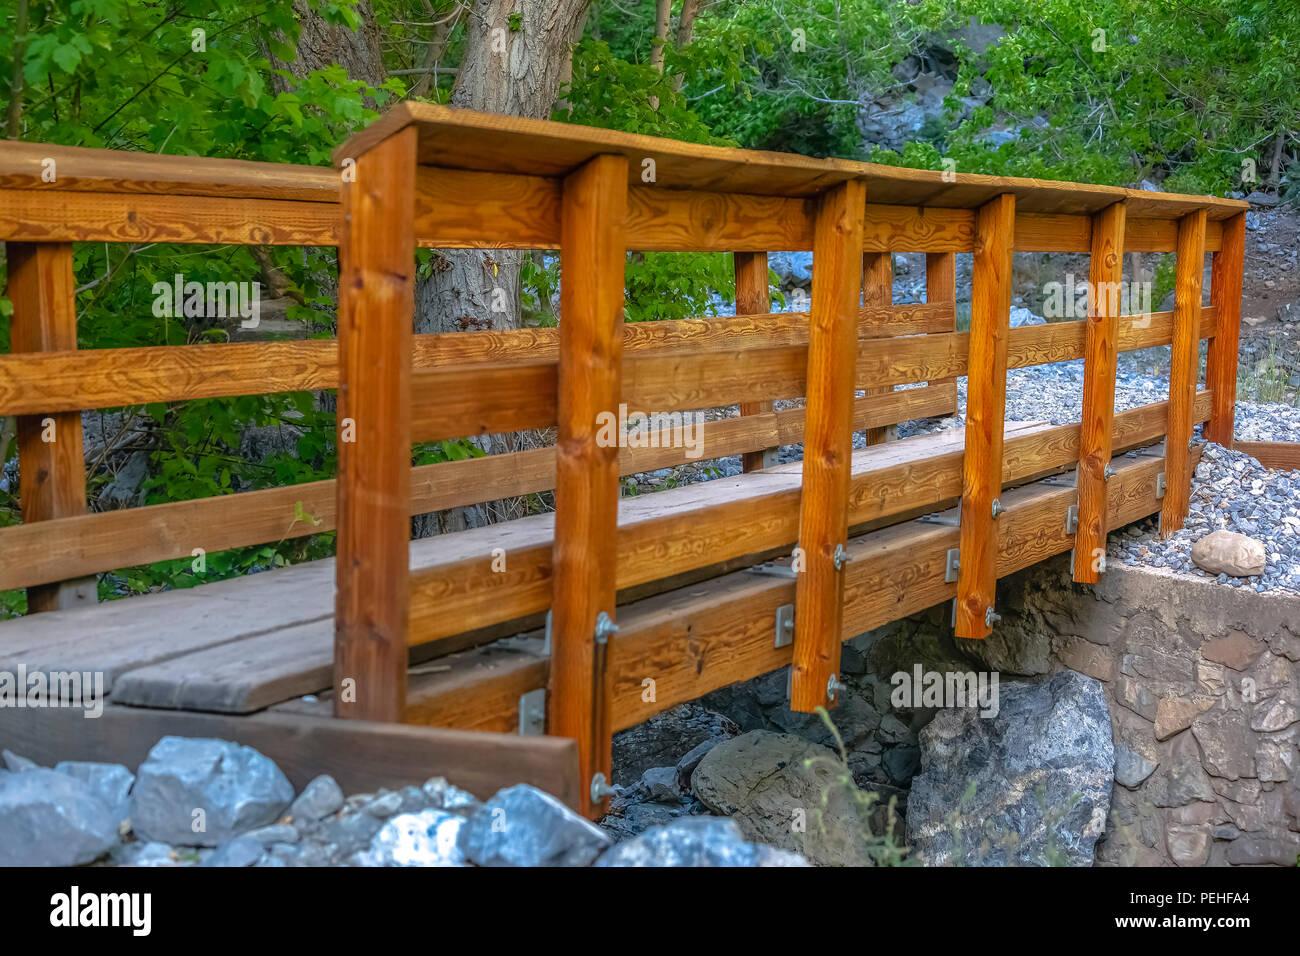 Wooden bridge over a rocky stream - Stock Image